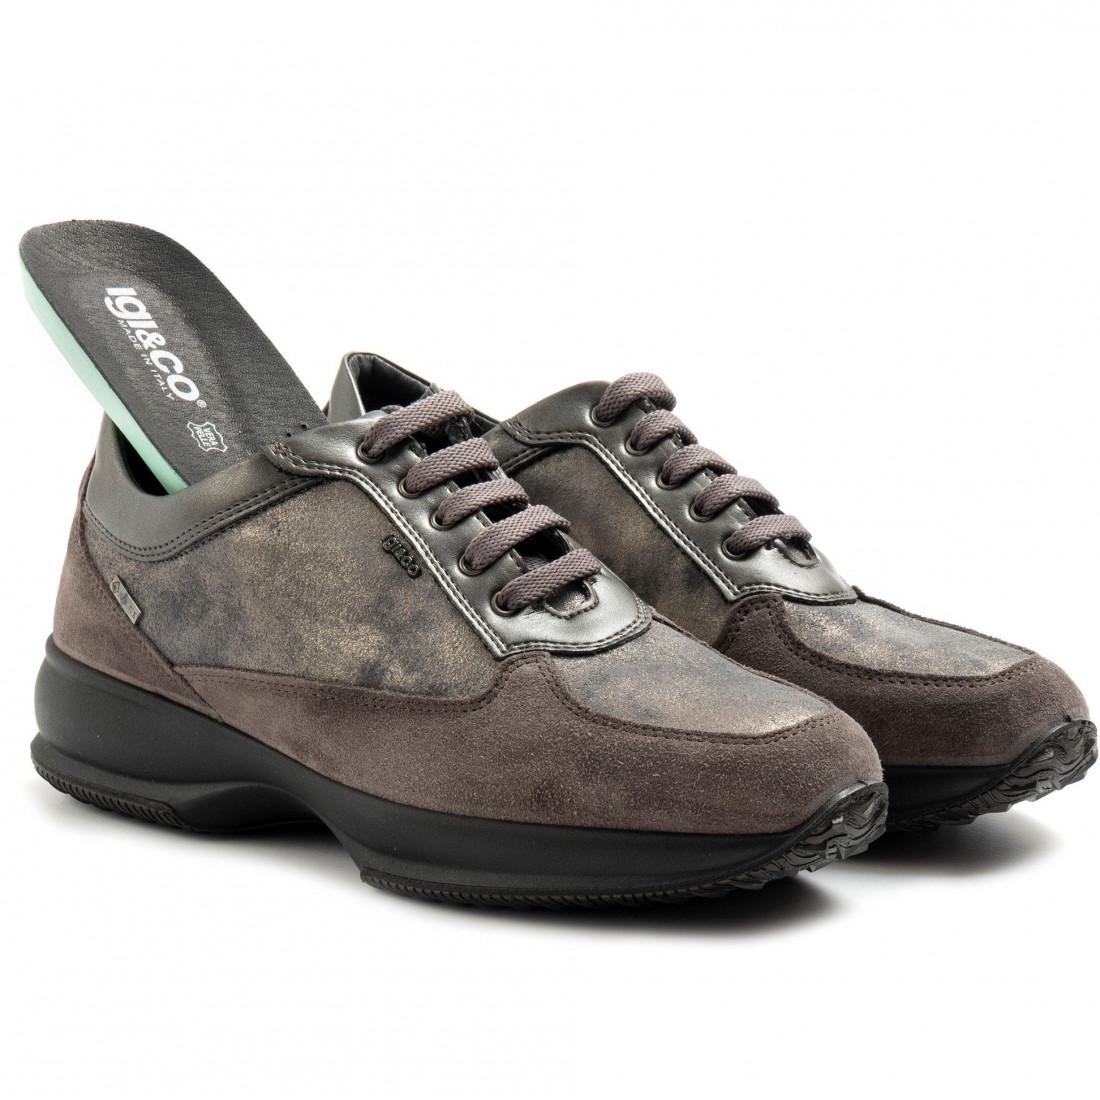 sneakers woman igico flex6163822 7821